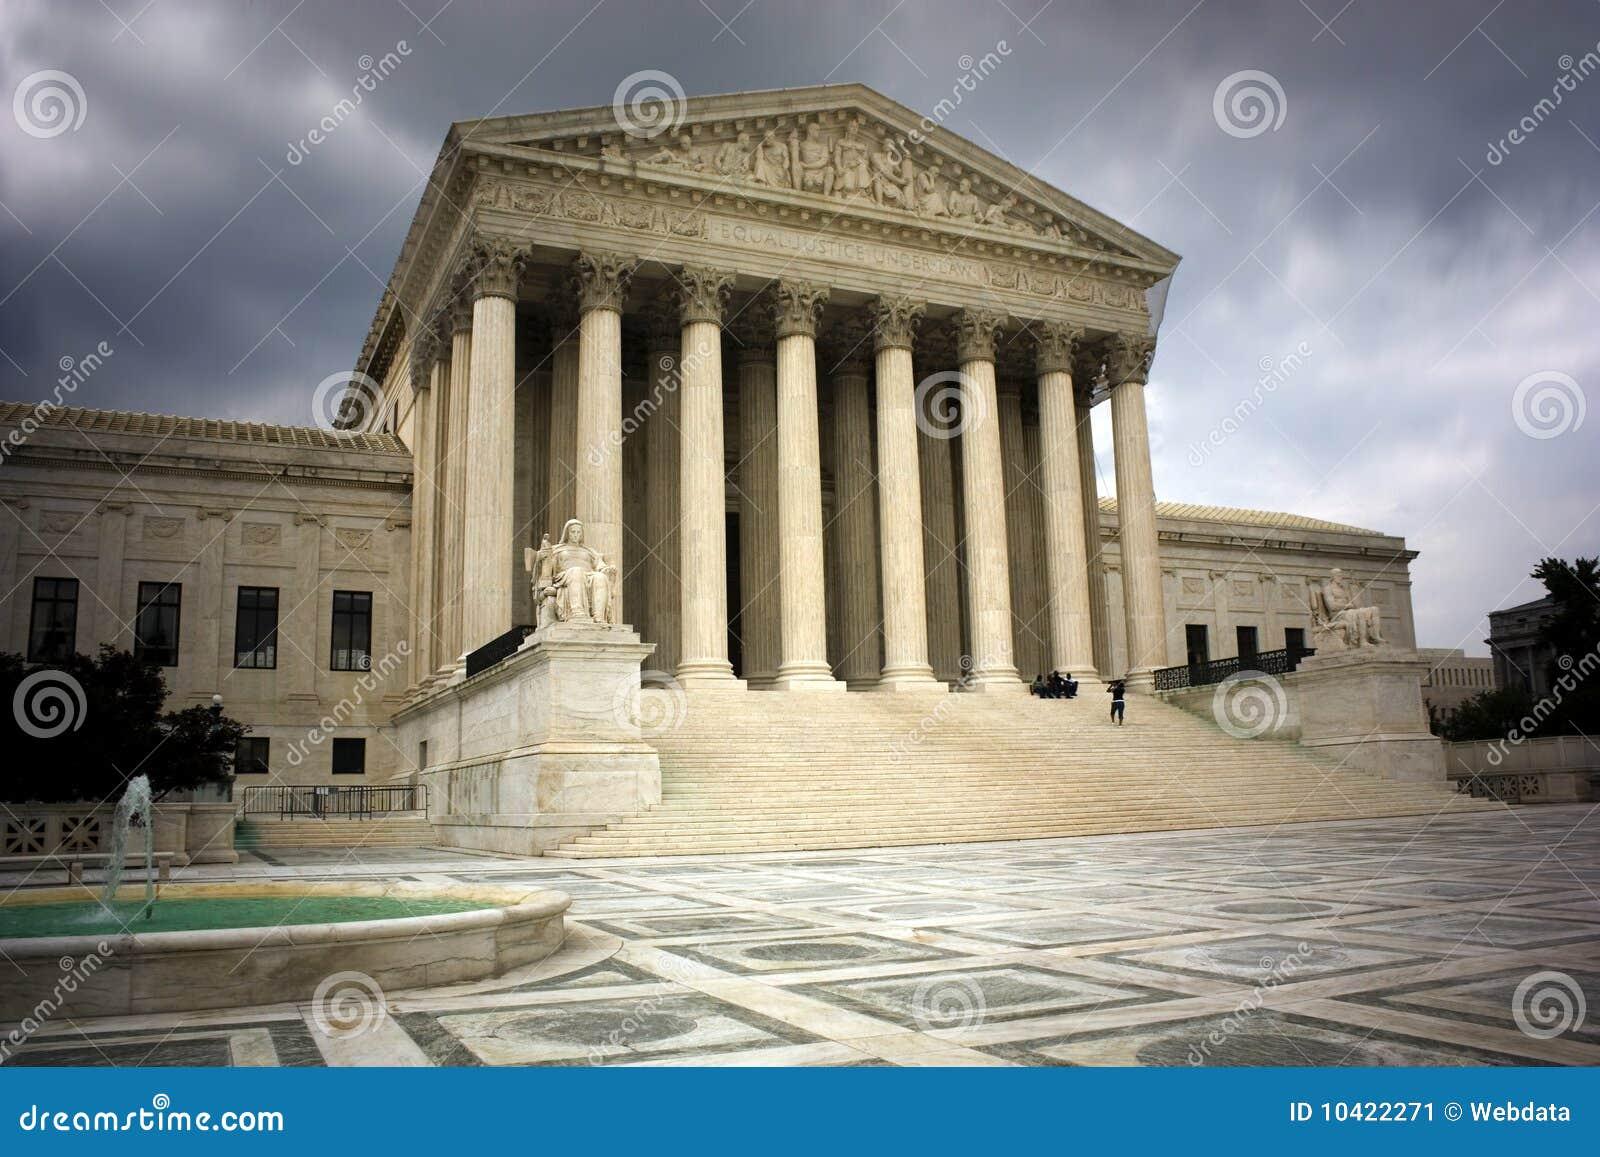 суд s высший u